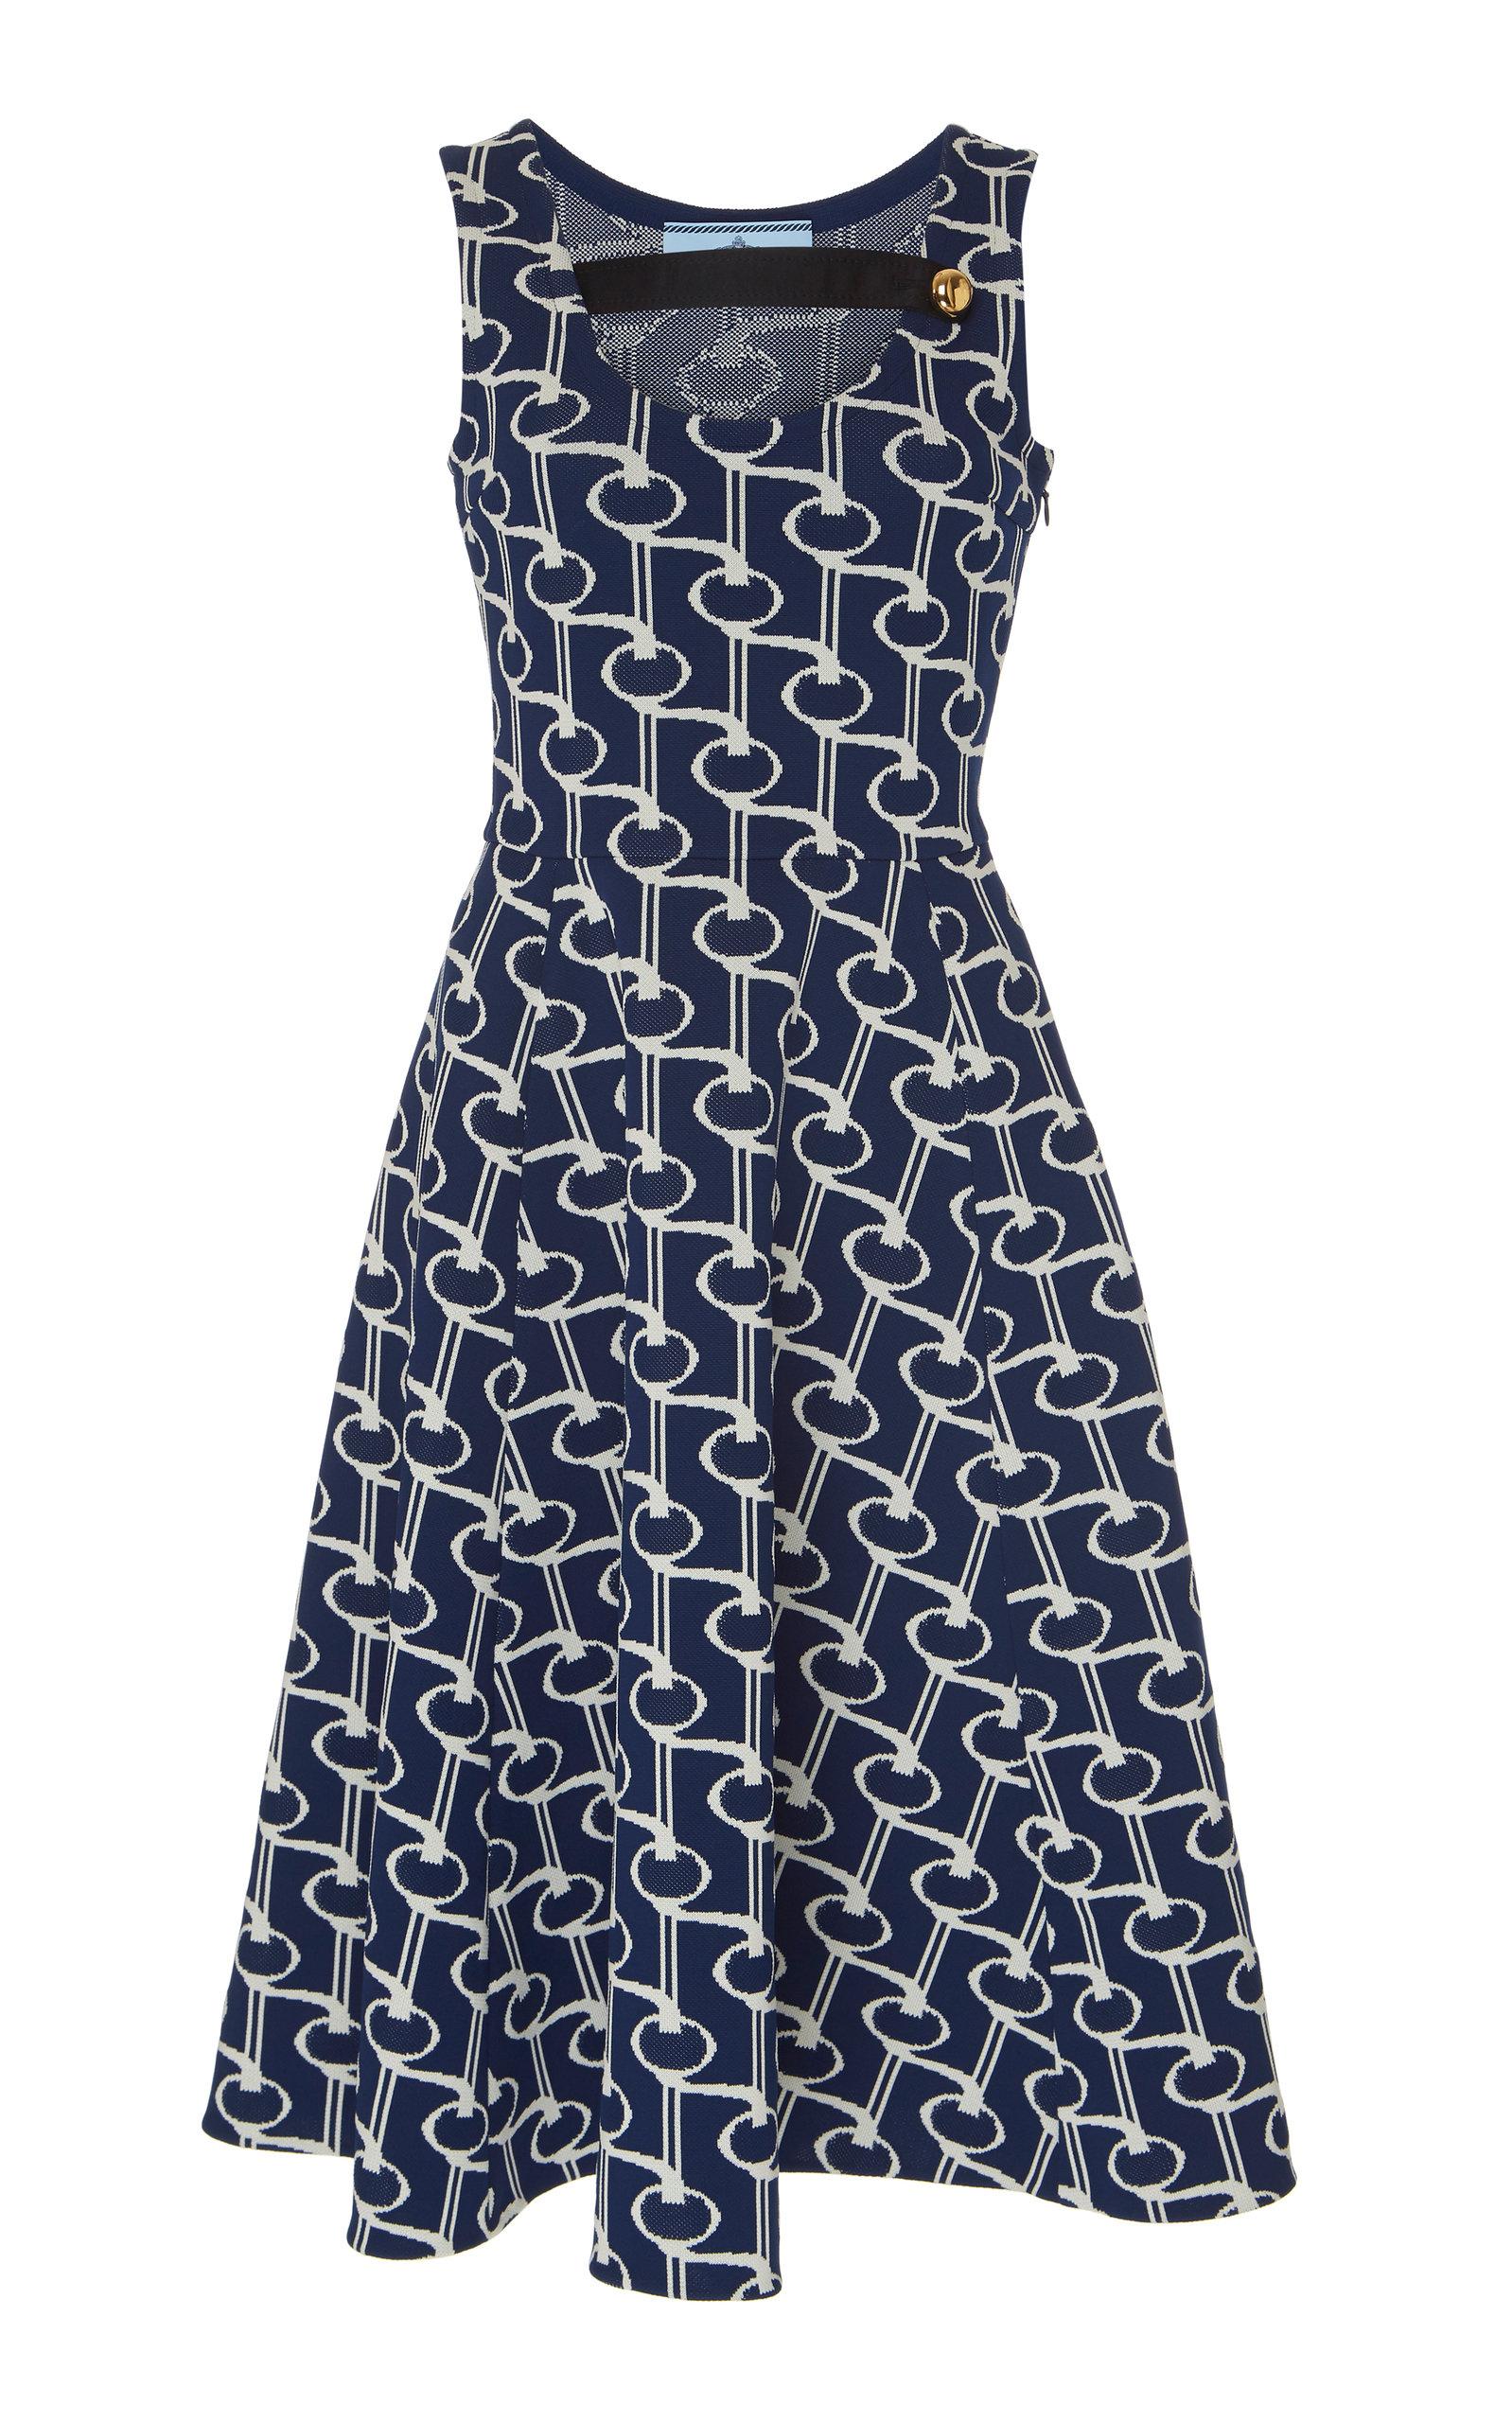 Buy Prada Button-Detailed Cotton-Jacquard Midi Dress online, shop Prada at the best price